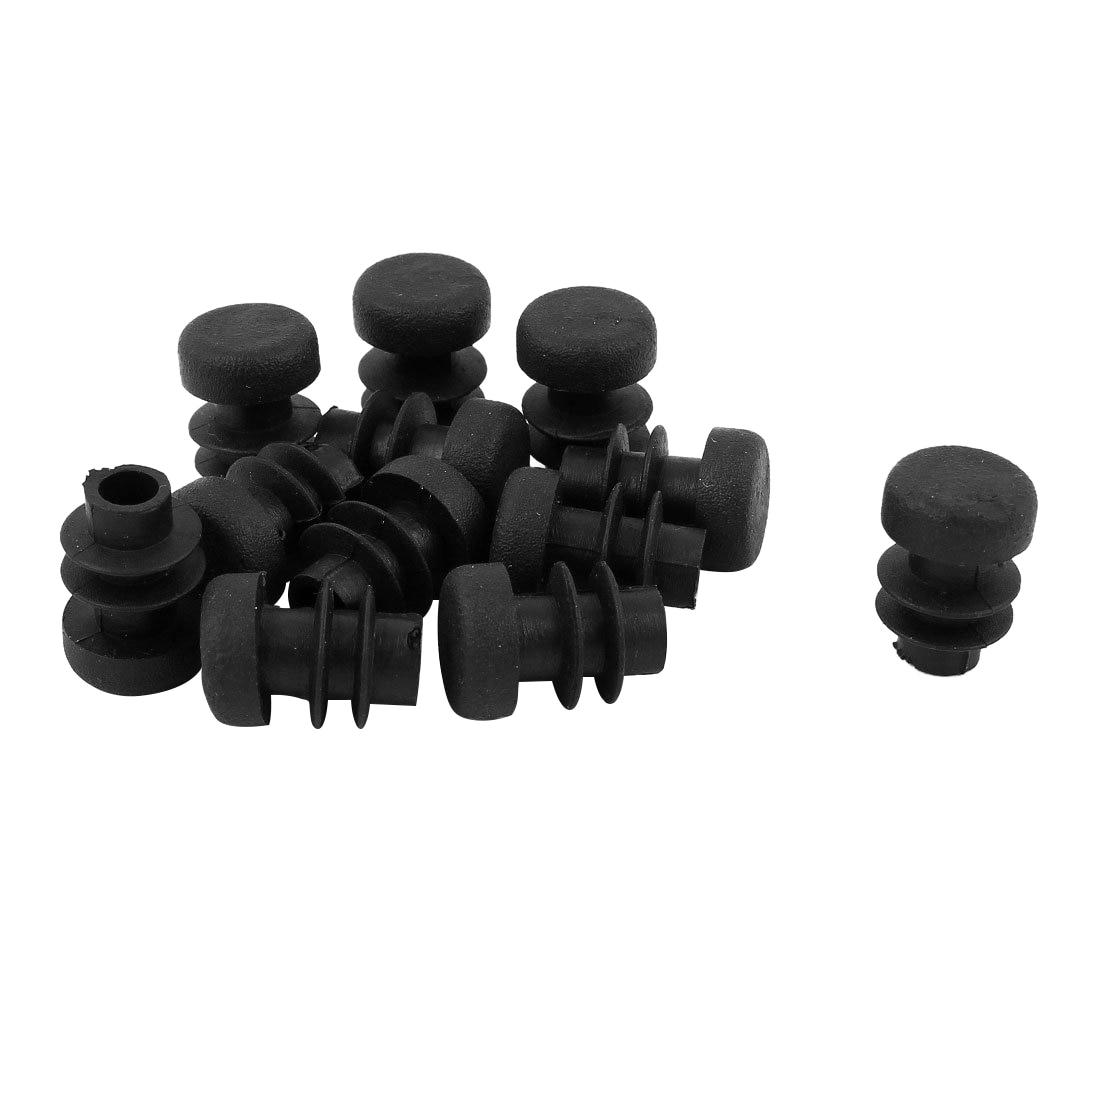 цена на Hot Sale 12 Pcs Plastic 12mm Pipe End Blanking Caps Bung Tube Insert Plug Round Black